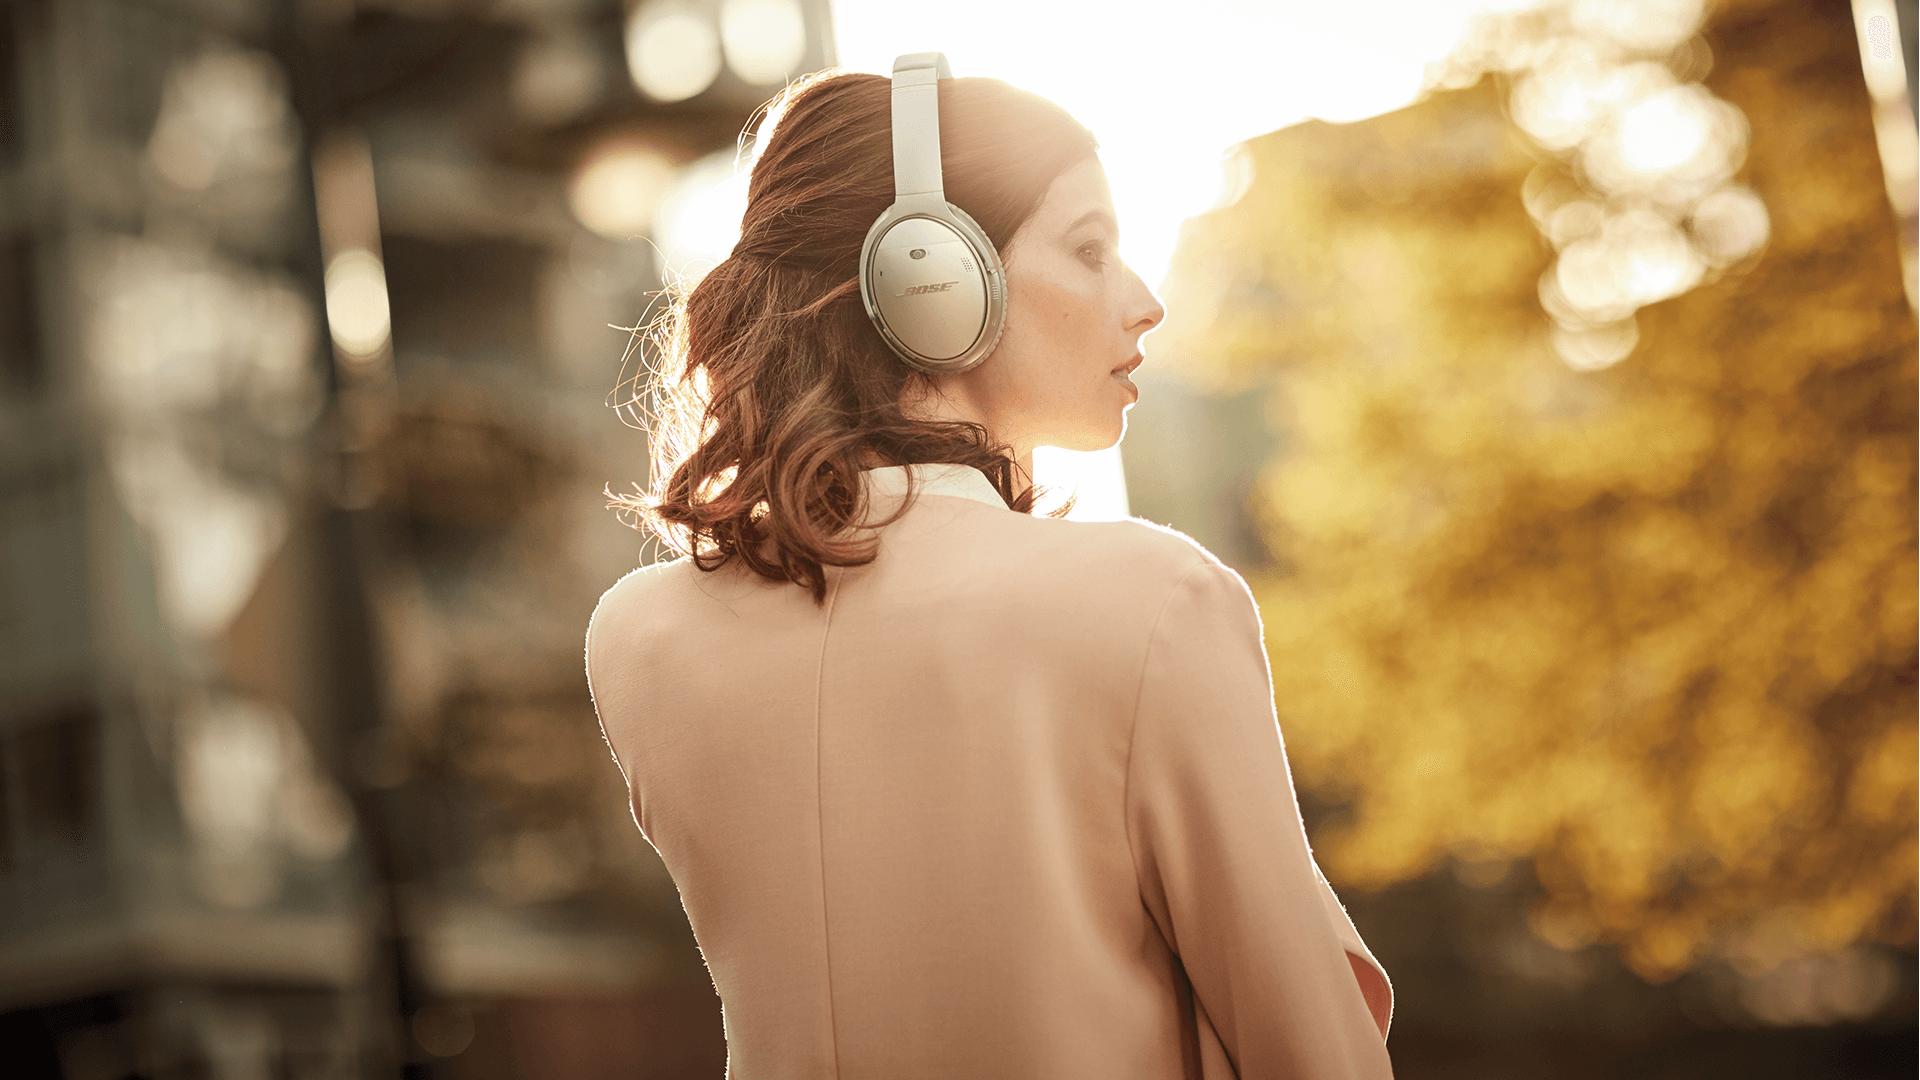 Bose QUIET COMFORT35 QuietComfort 35 Wireless Bluetooth Around-Ear